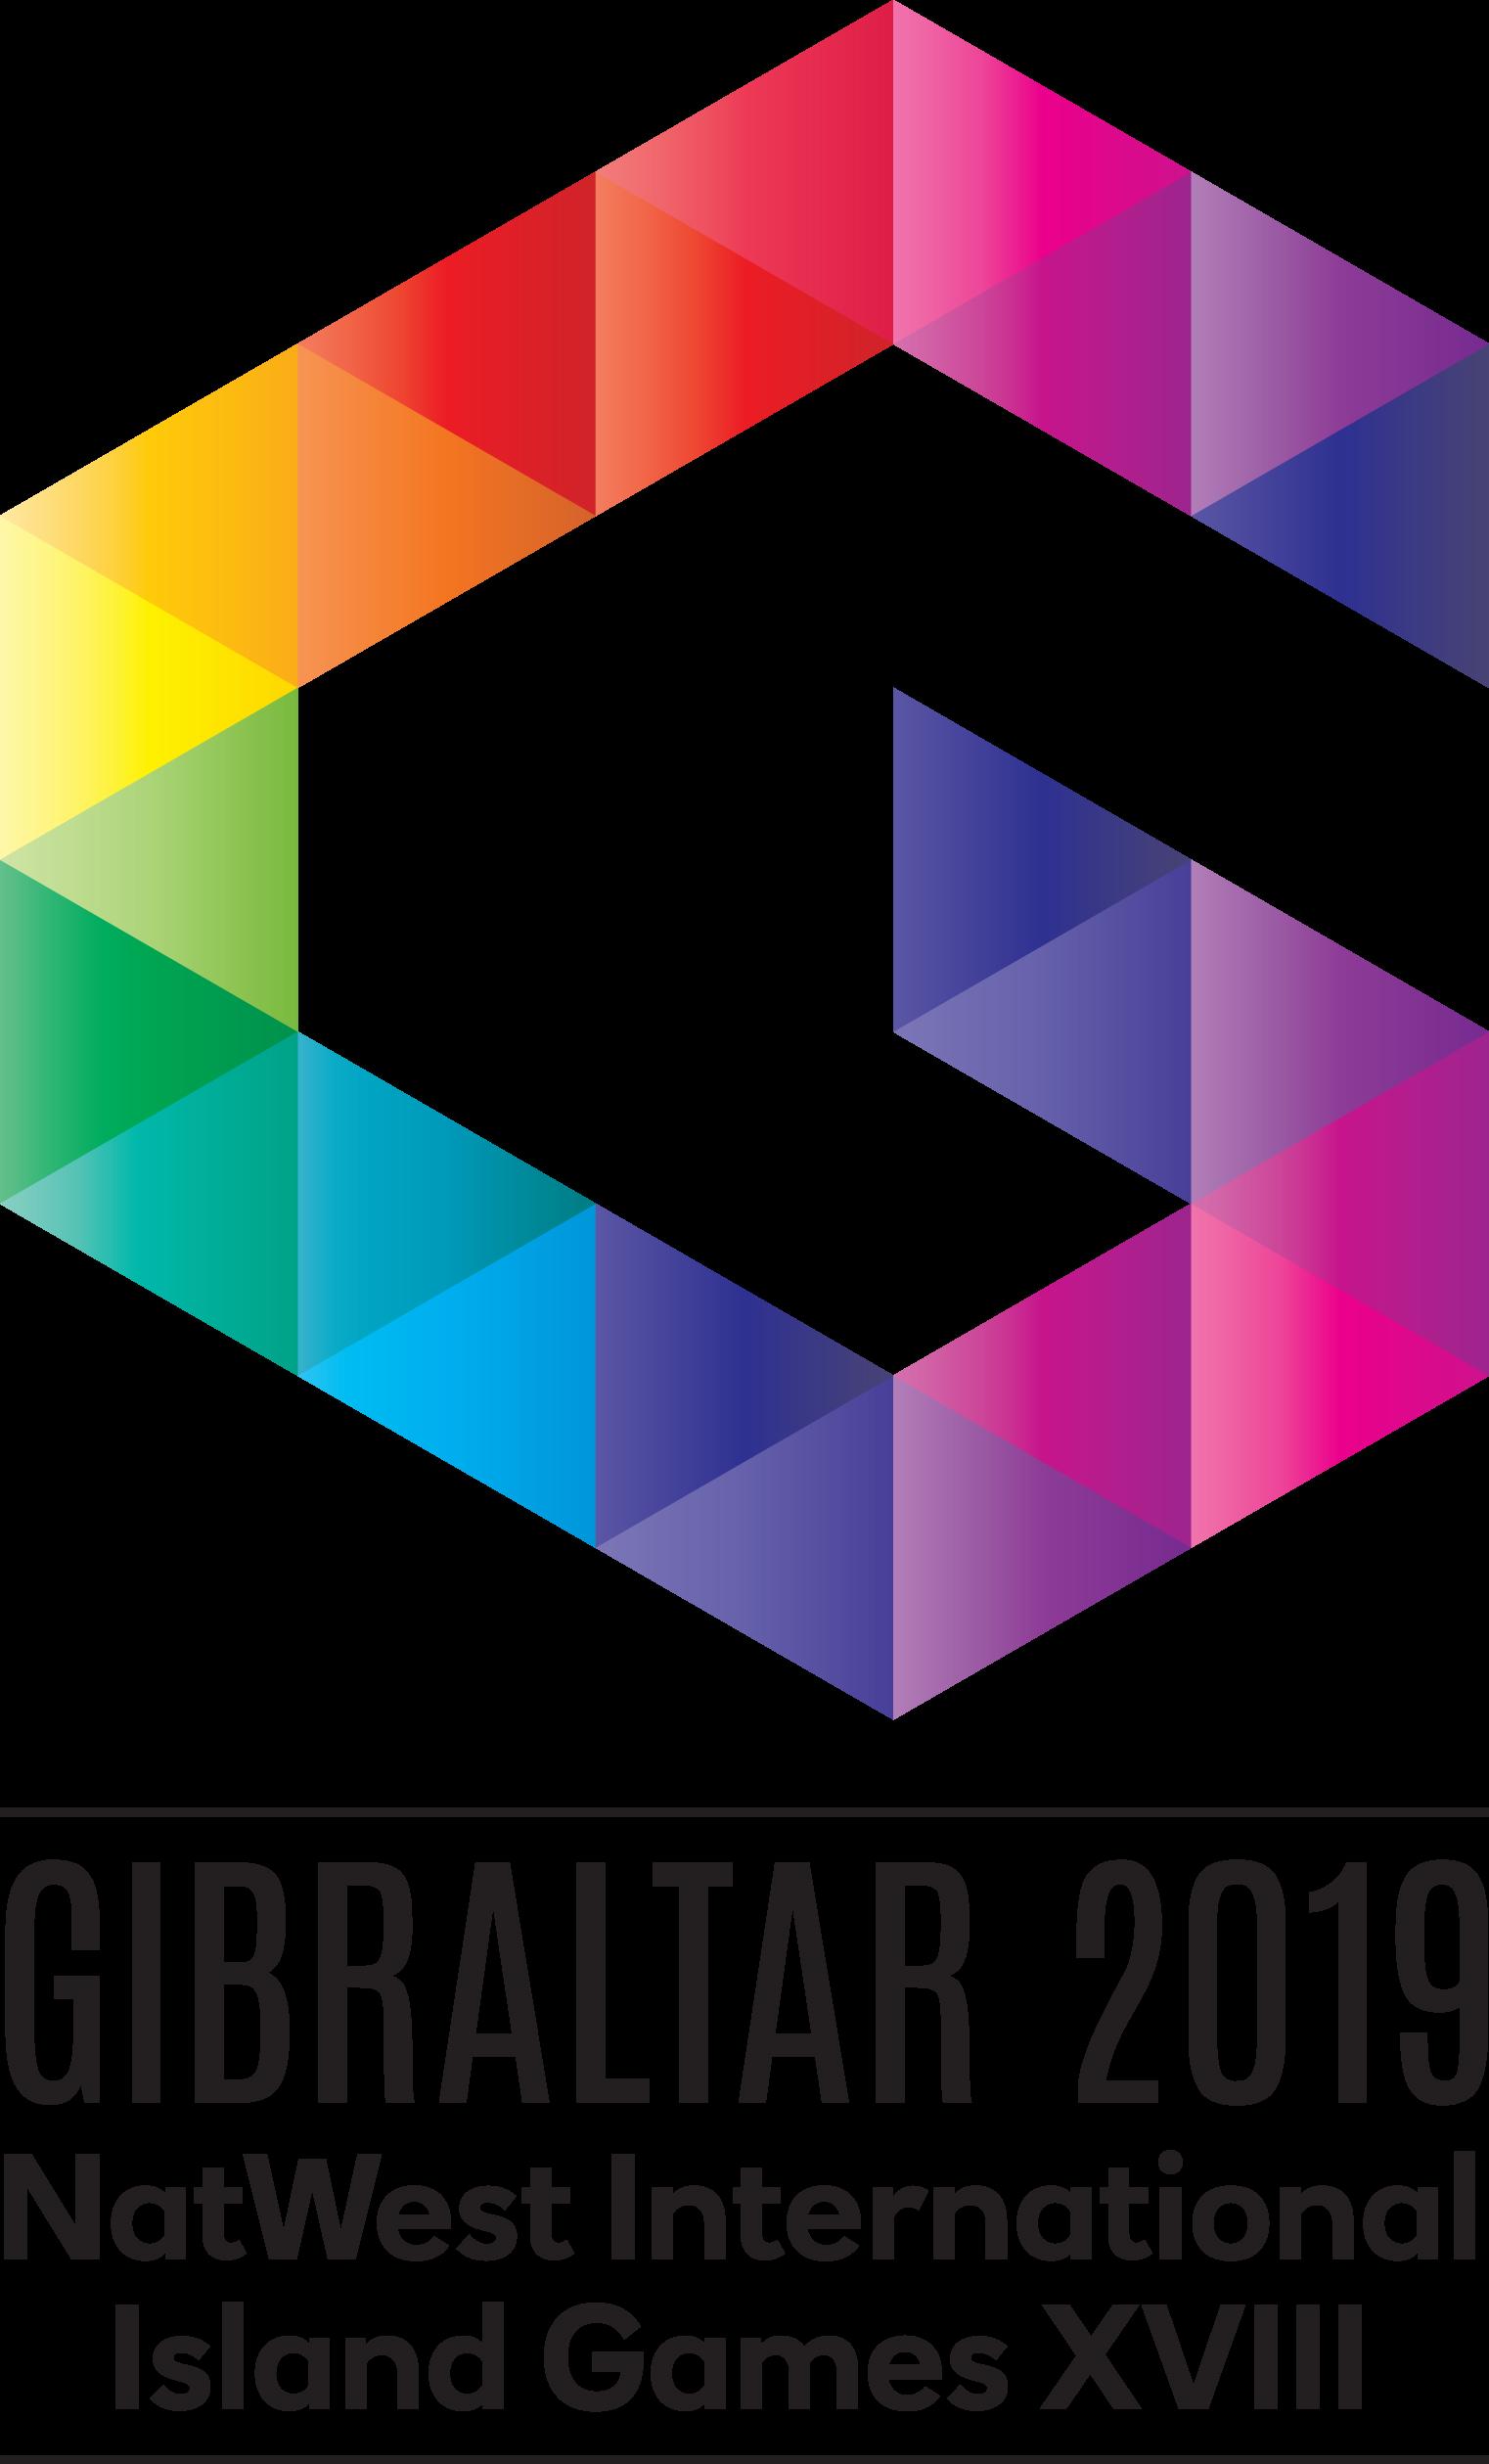 Media | Gibraltar 2019 Natwest International Island Games XVIII